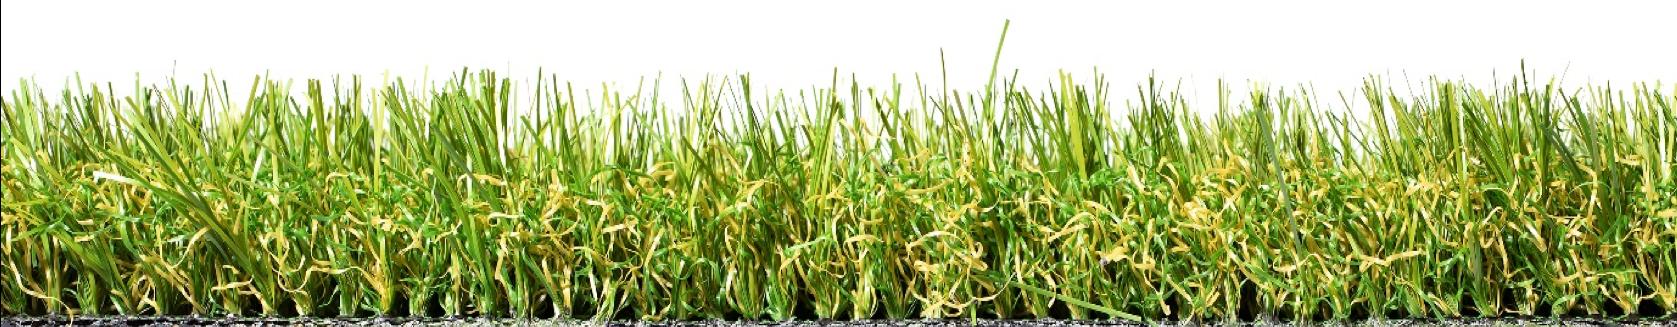 Albany Artificial Grass_the-grassman.co.uk